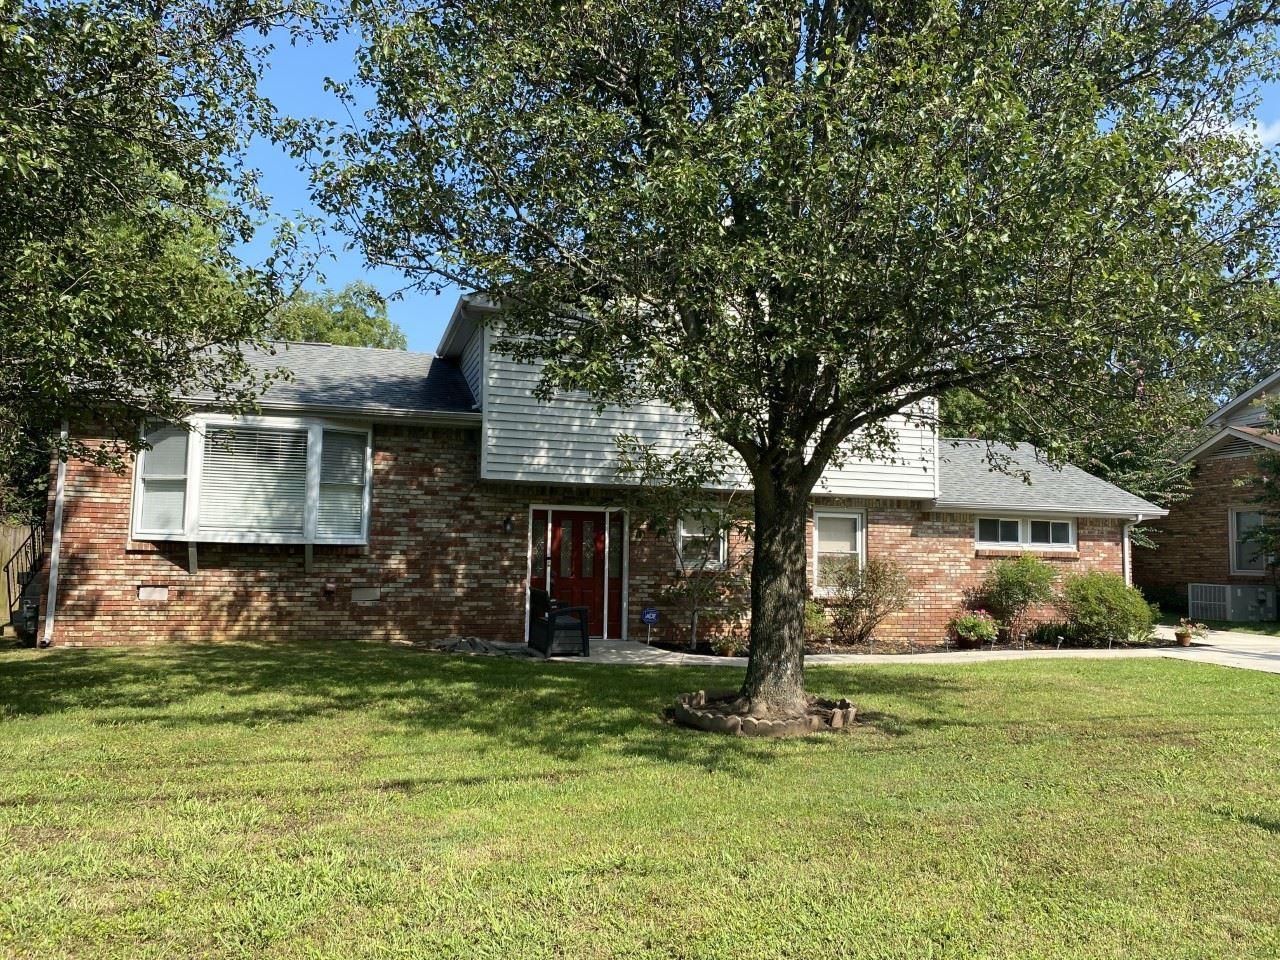 420 Owendale Dr, Antioch, TN 37013 - MLS#: 2284345